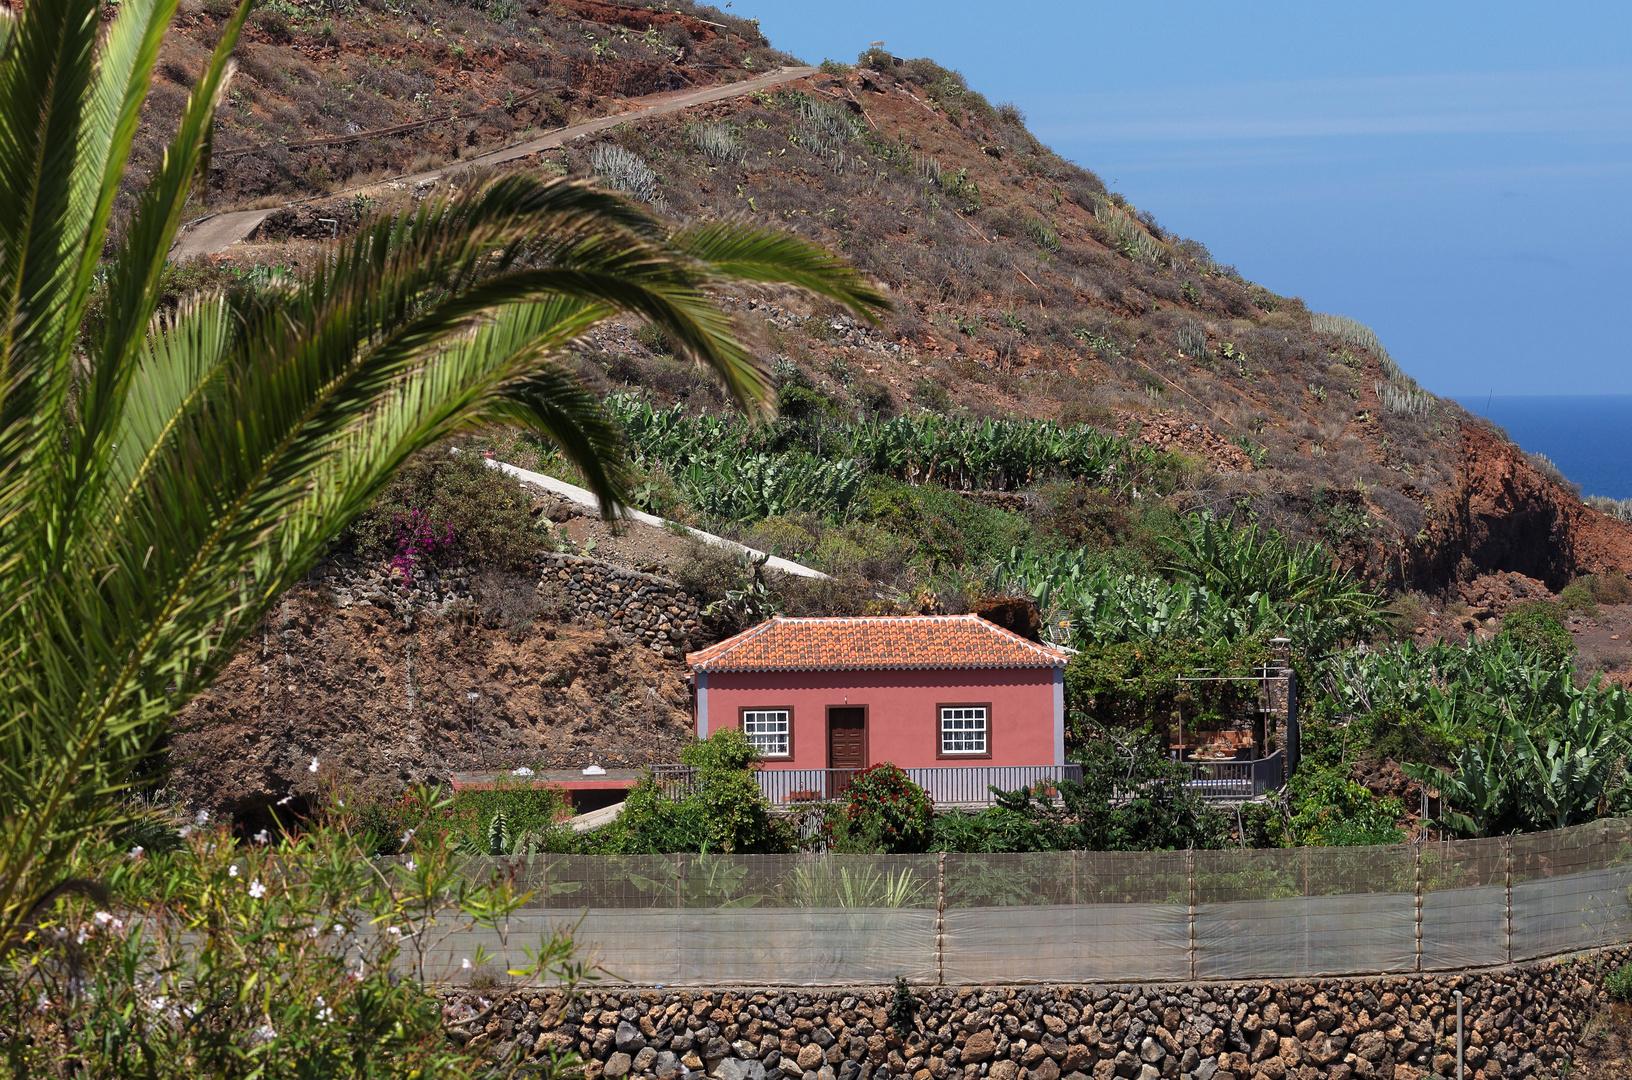 Bananenplantage, Nähe La Fajana, La Palma, September 2013